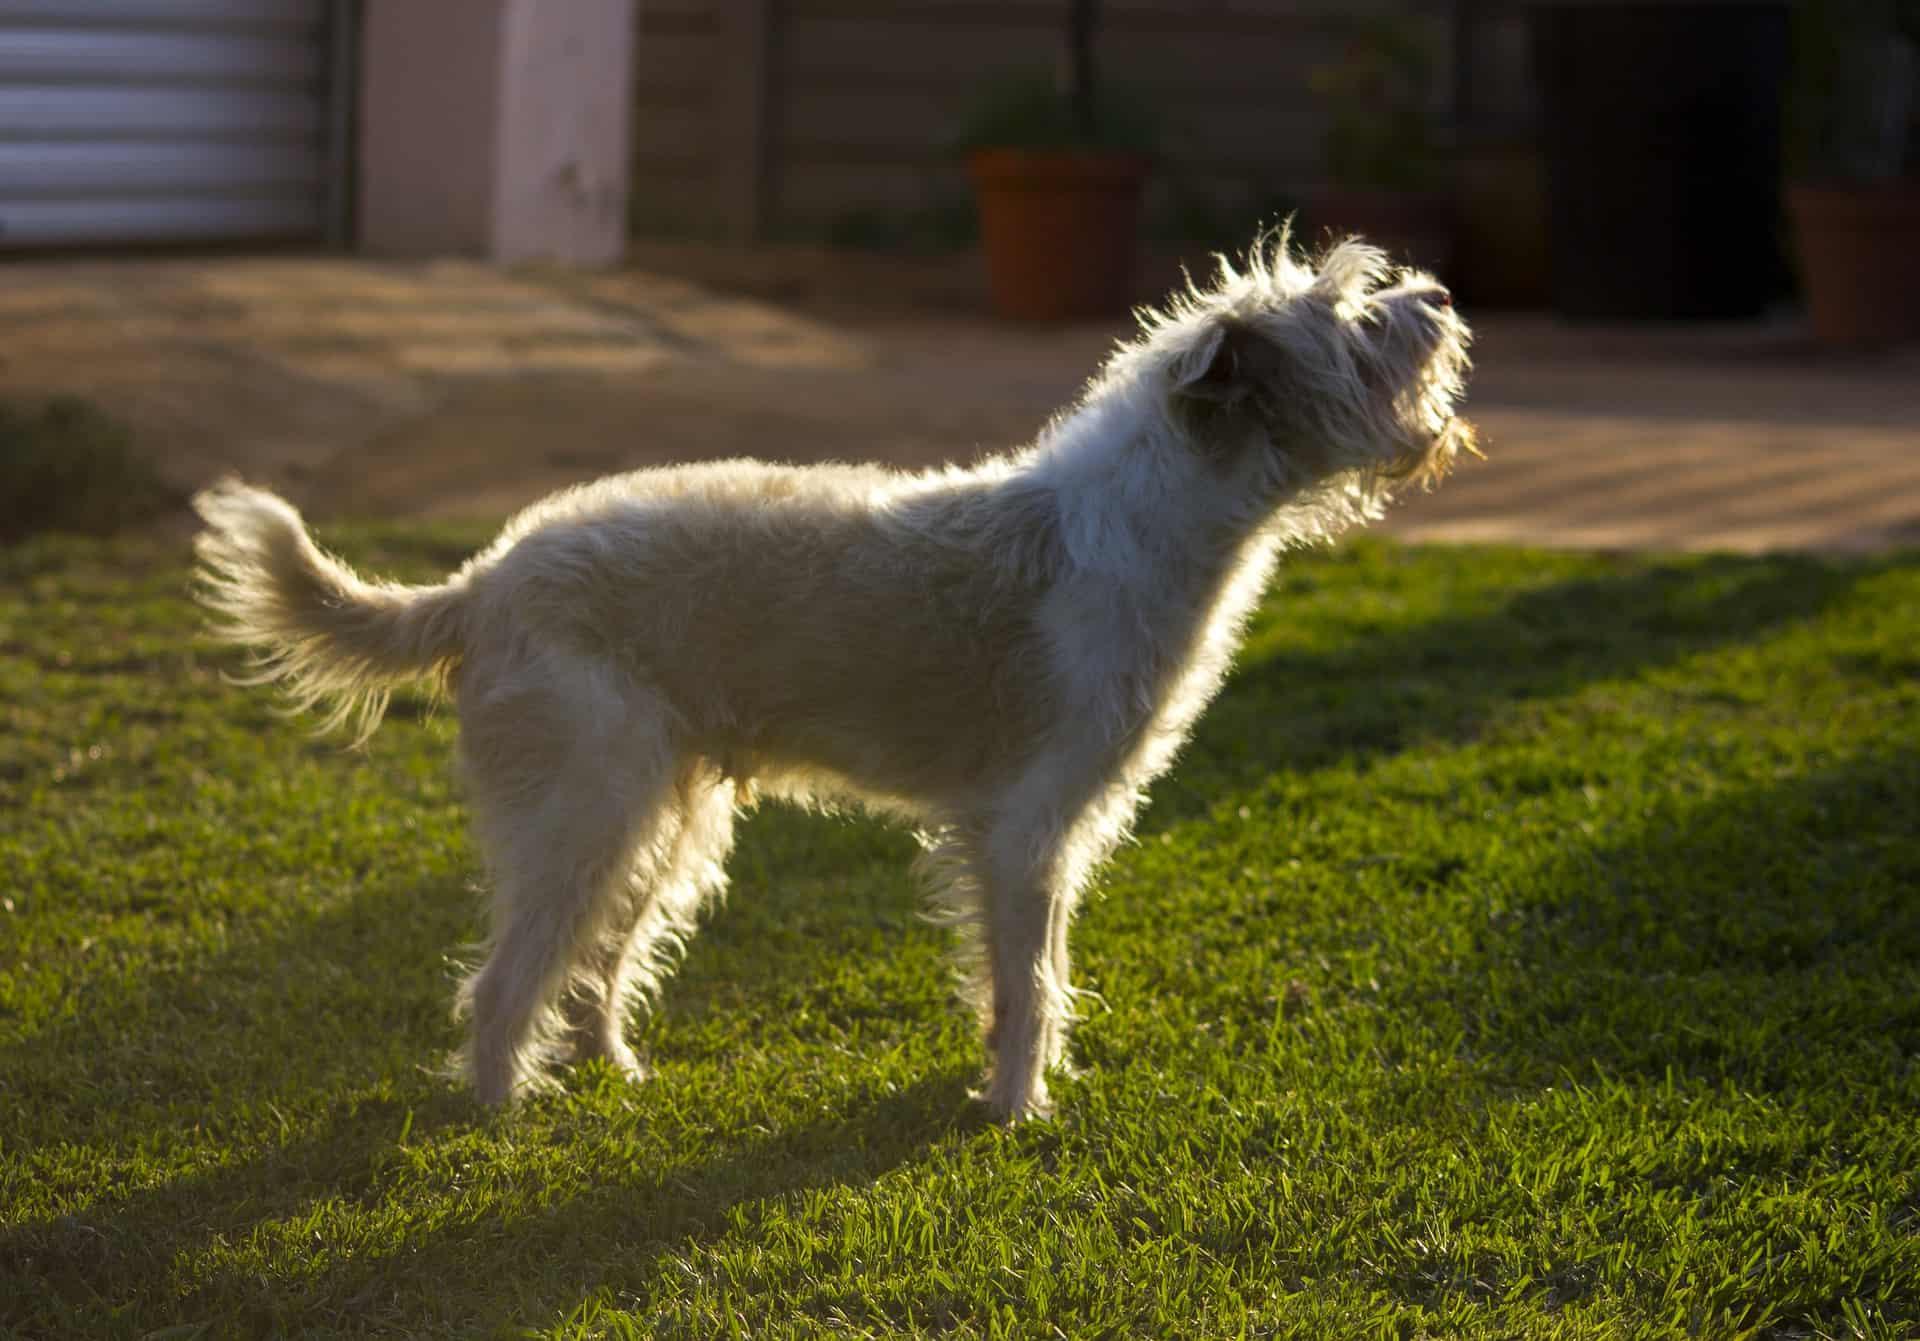 Barking dog in garden